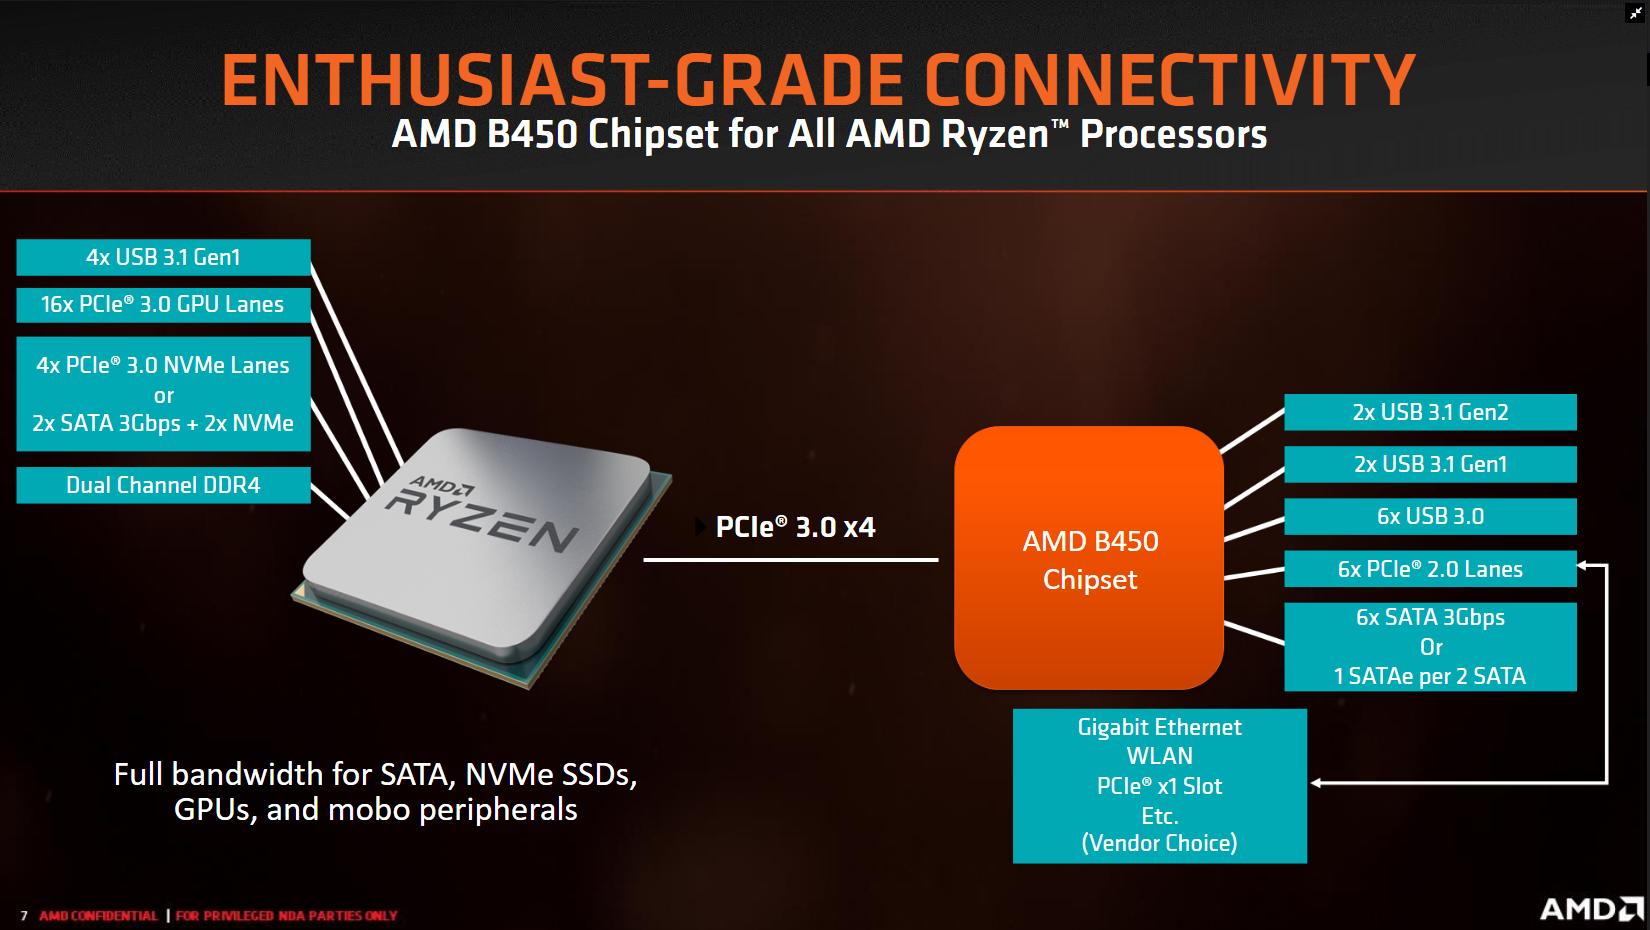 Amd Officially Unveils The Ryzen B450 Chipset